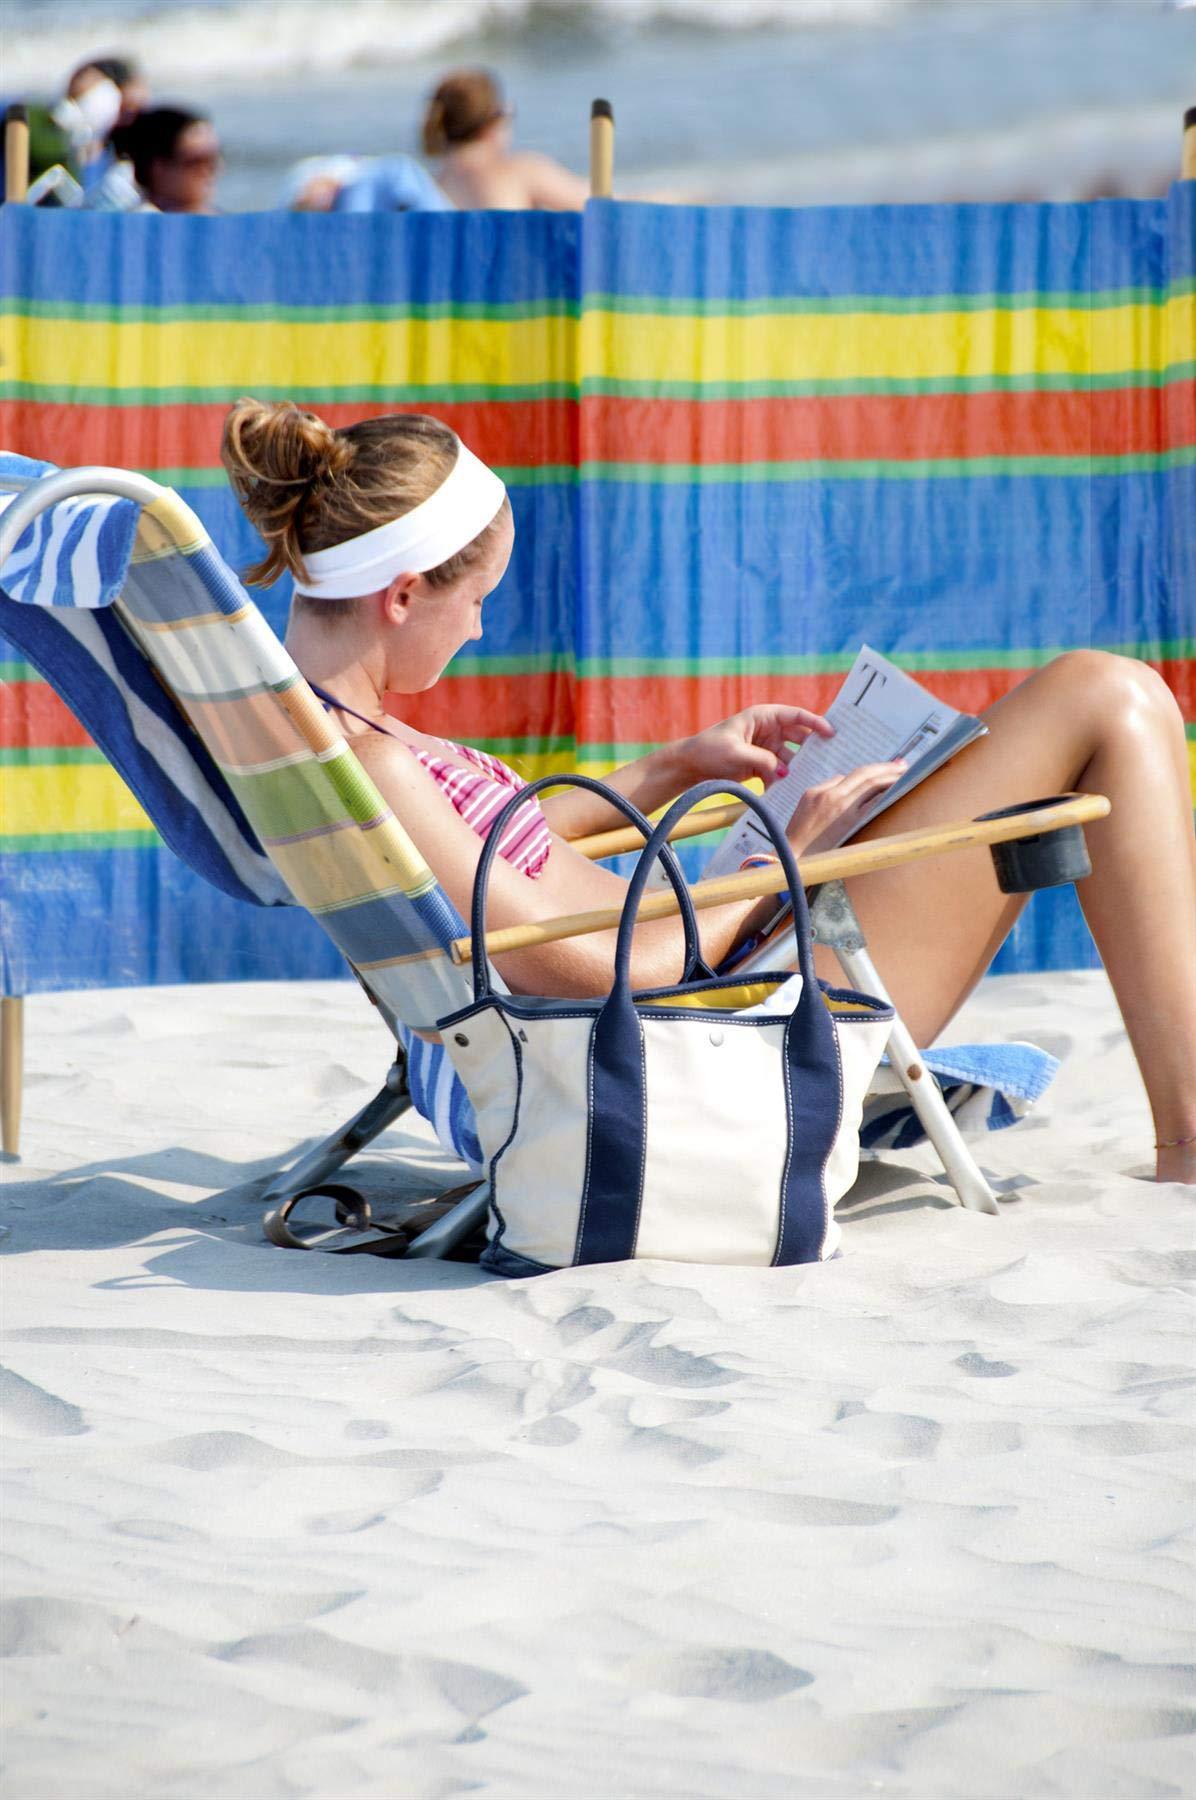 Vinsani® 4, 5, 6, 8, 10 POLE BEACH HOLIDAY CARAVAN CAMPING WINDBREAK TALL WINDBREAKERS 3